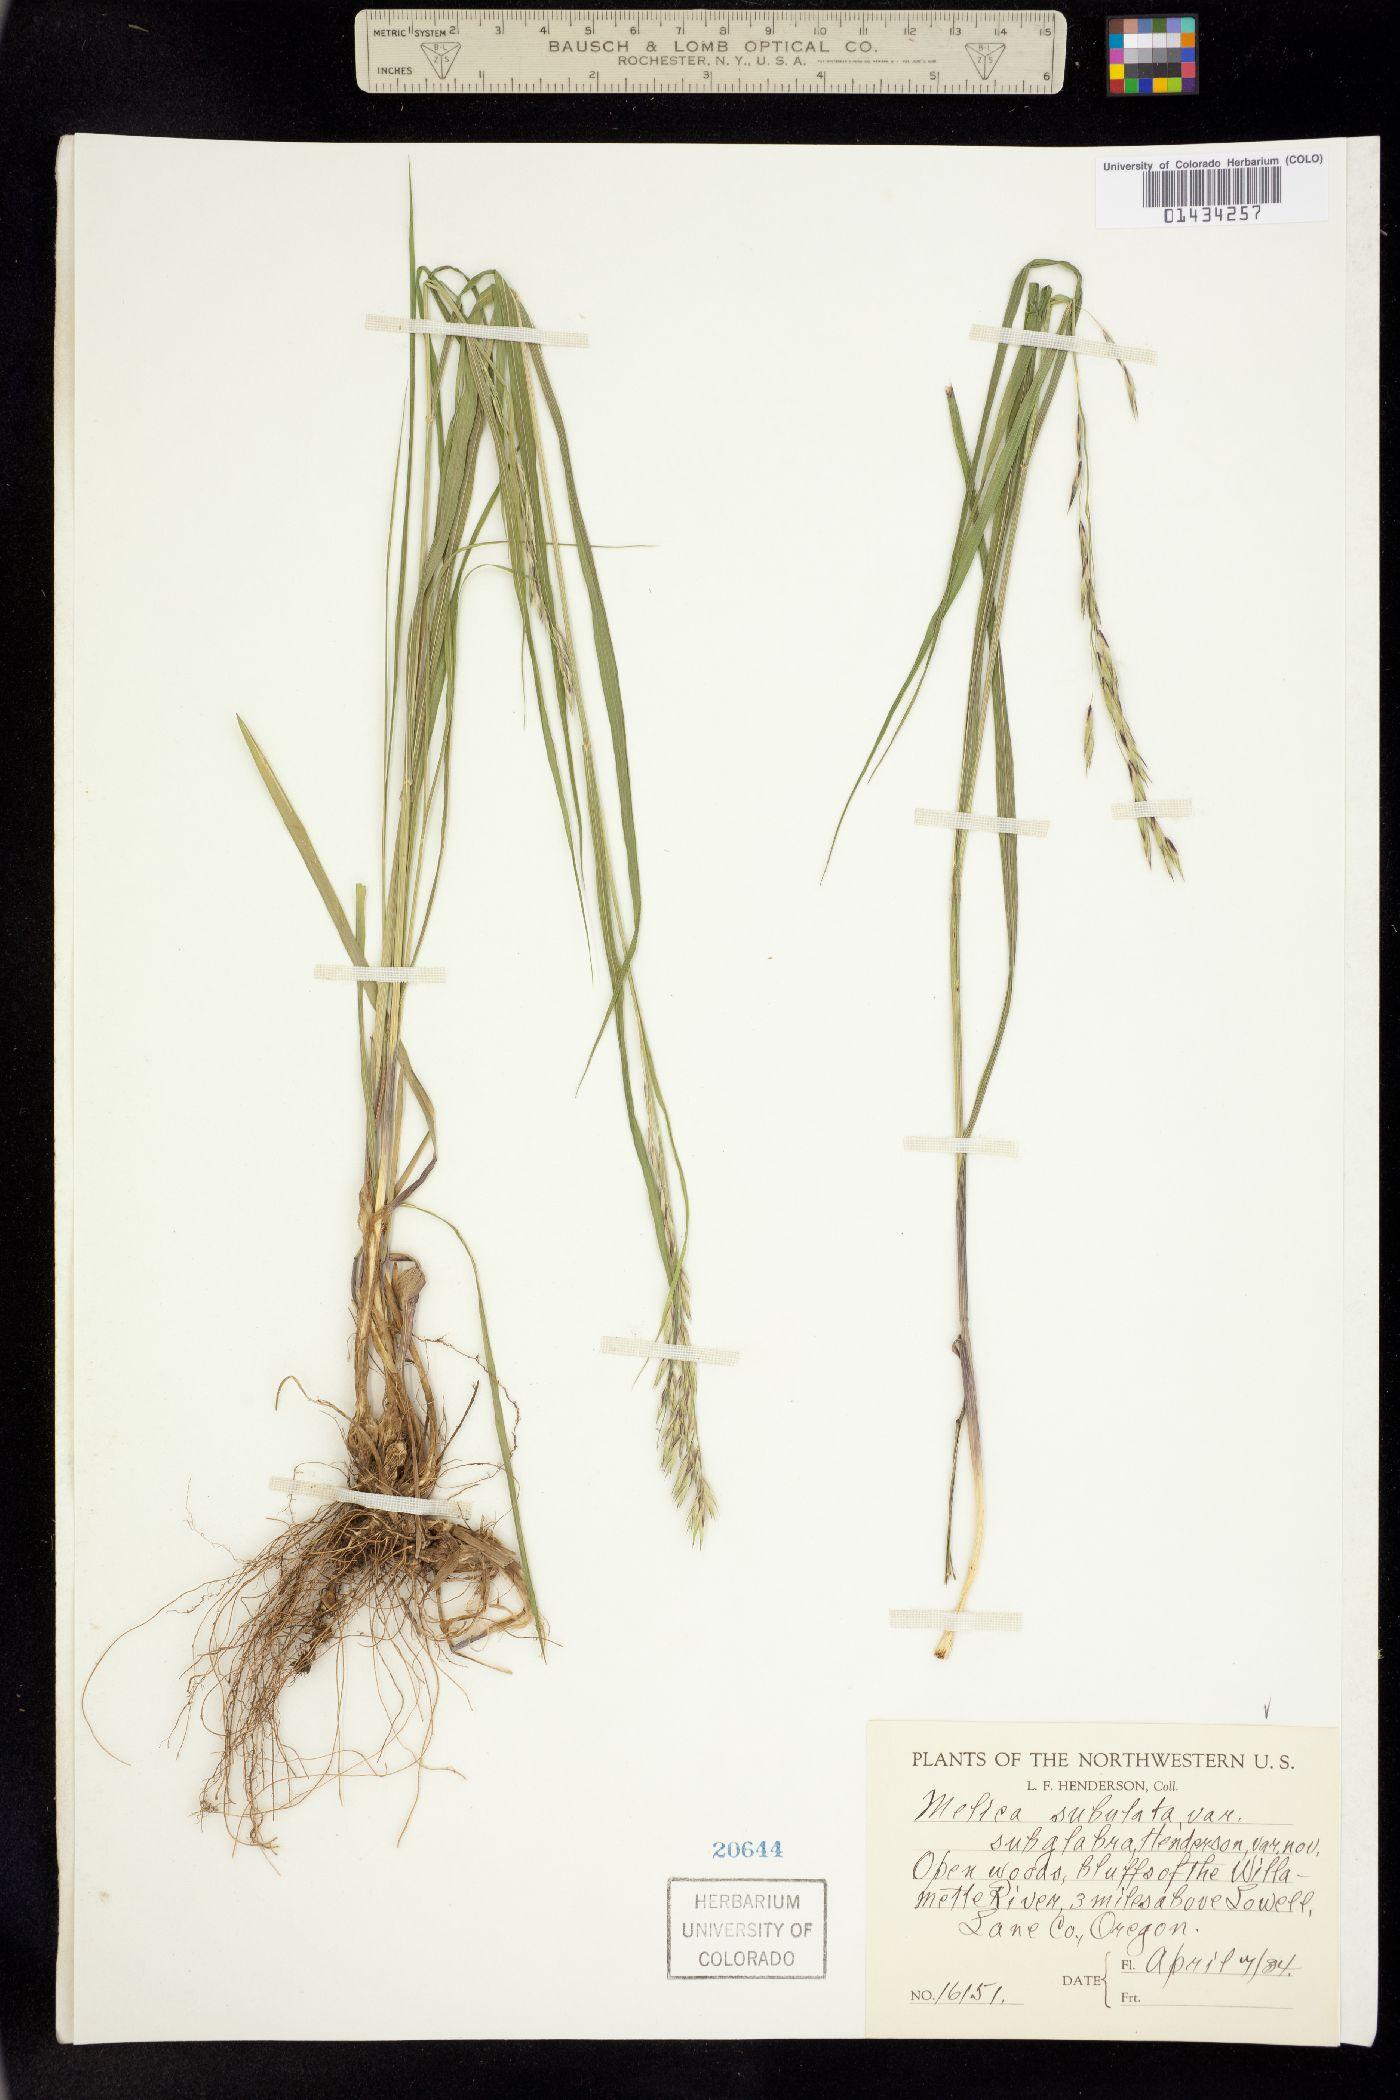 Bromelica subulata image